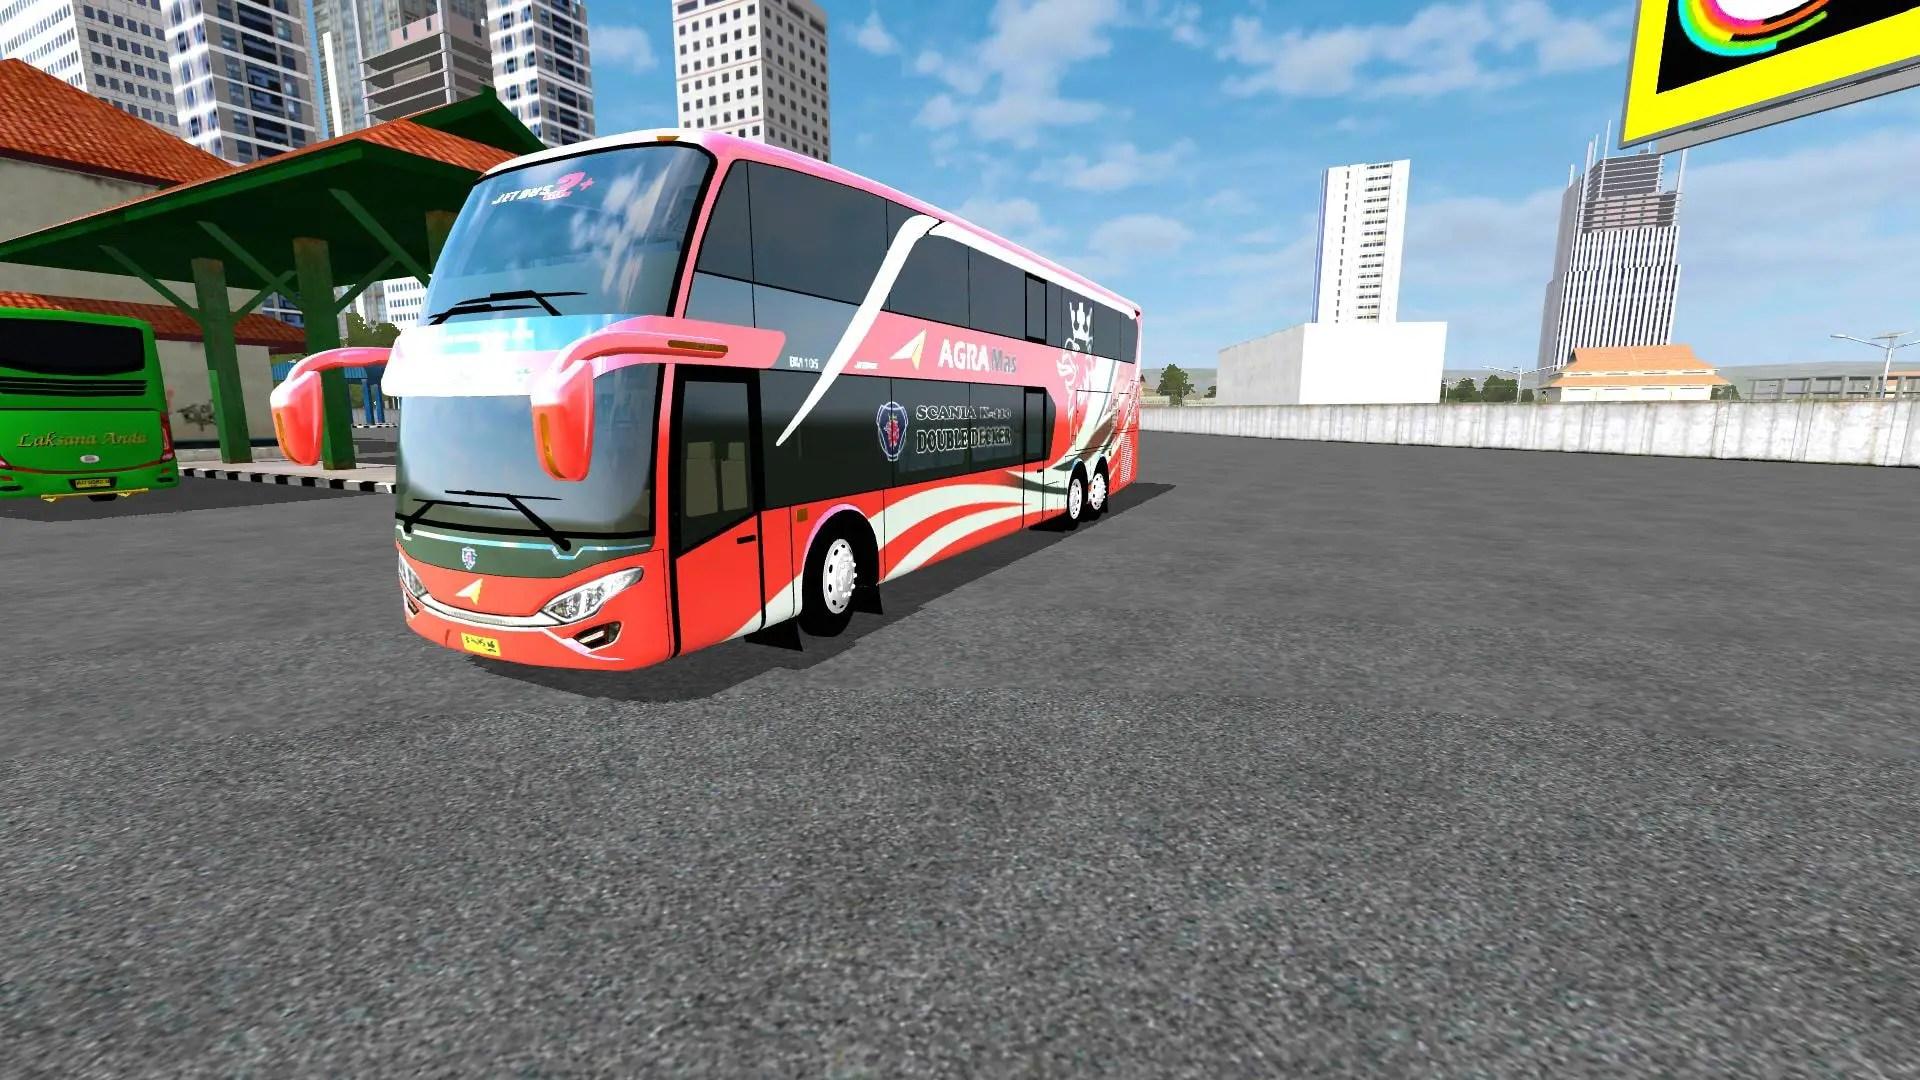 Download Jetbus2+ SDD Doubel Decker Vehicle Mod for Bus Simulator Indonesia, , Bus Mod, Bus Simulator Indonesia Mod, BUSSID mod, Mod, Vehicle Mod